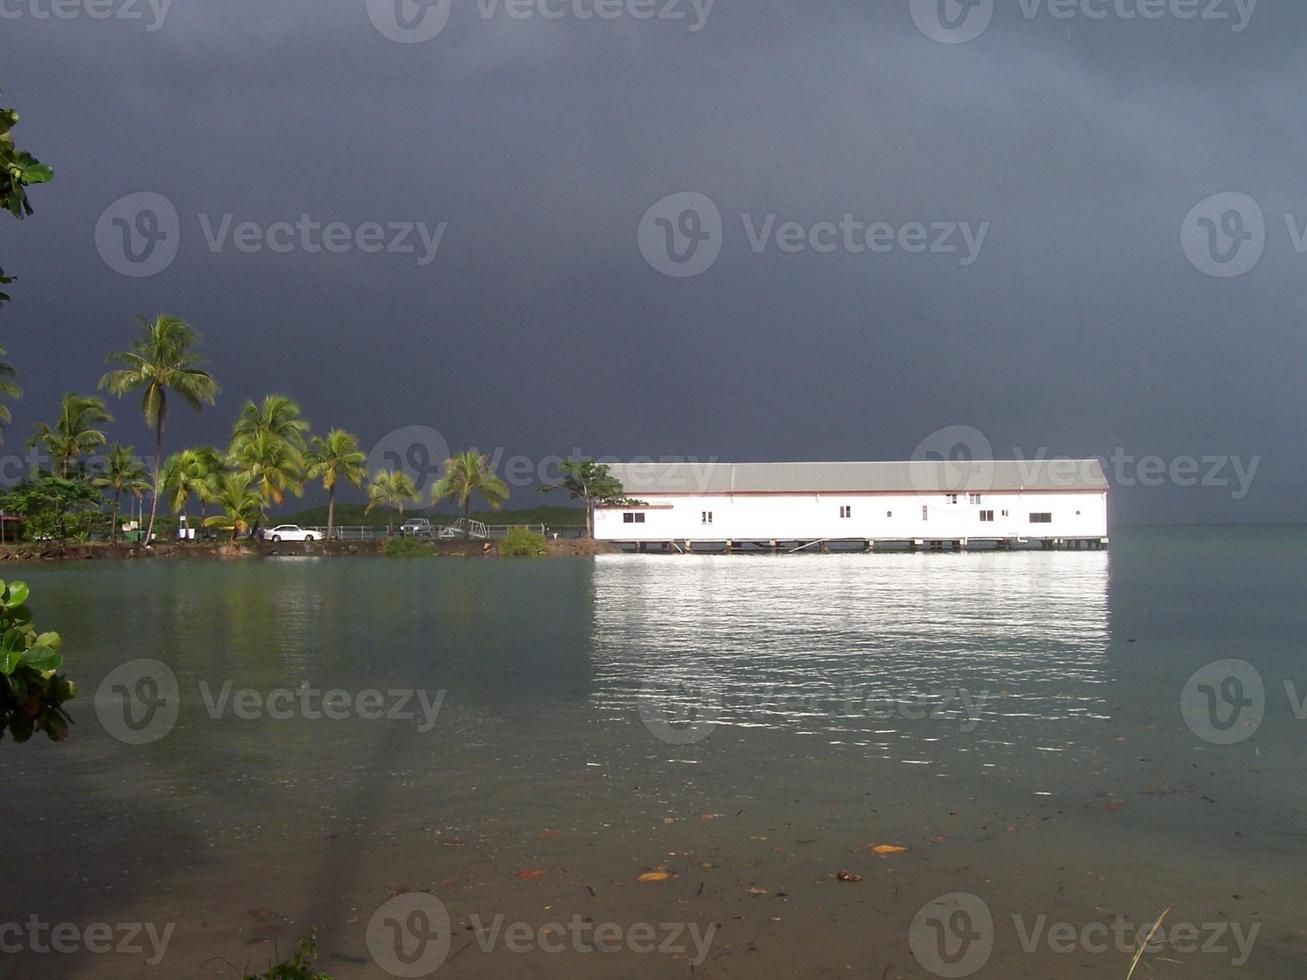 stormachtige lucht over witte botenhuis foto